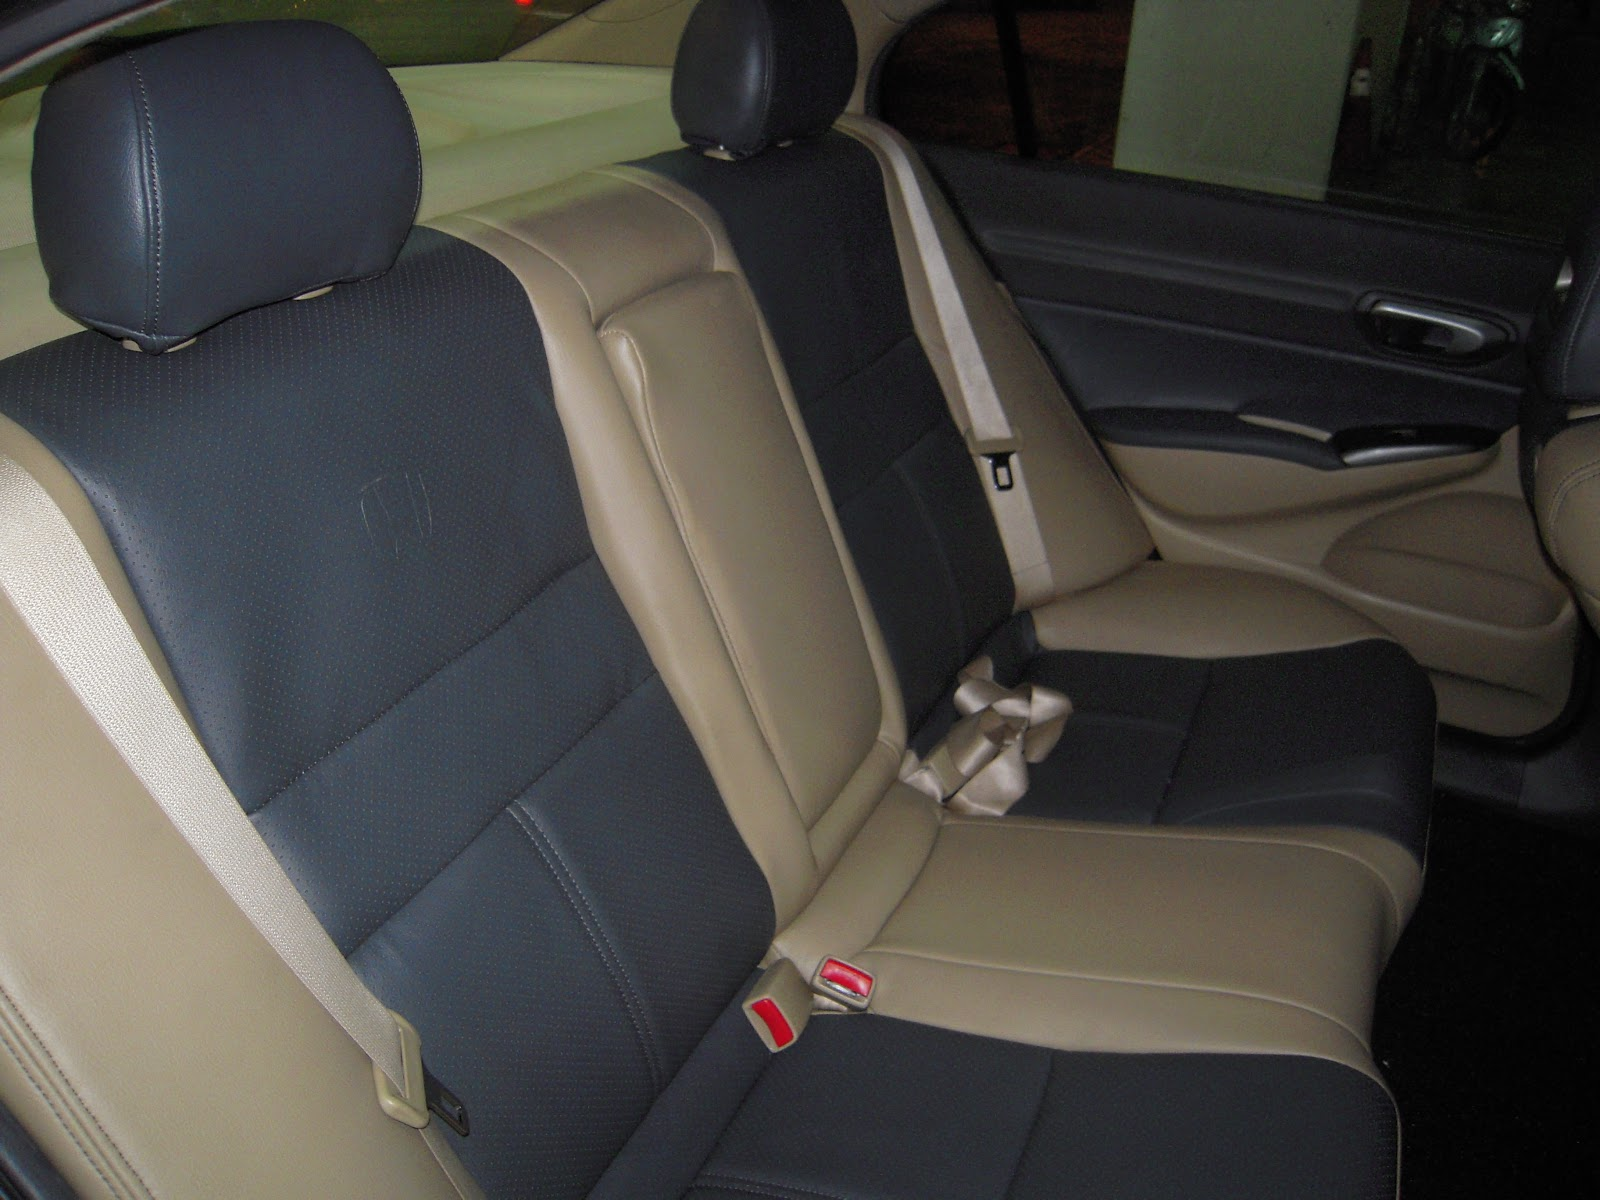 Honda Car Seat Covers In Calgary